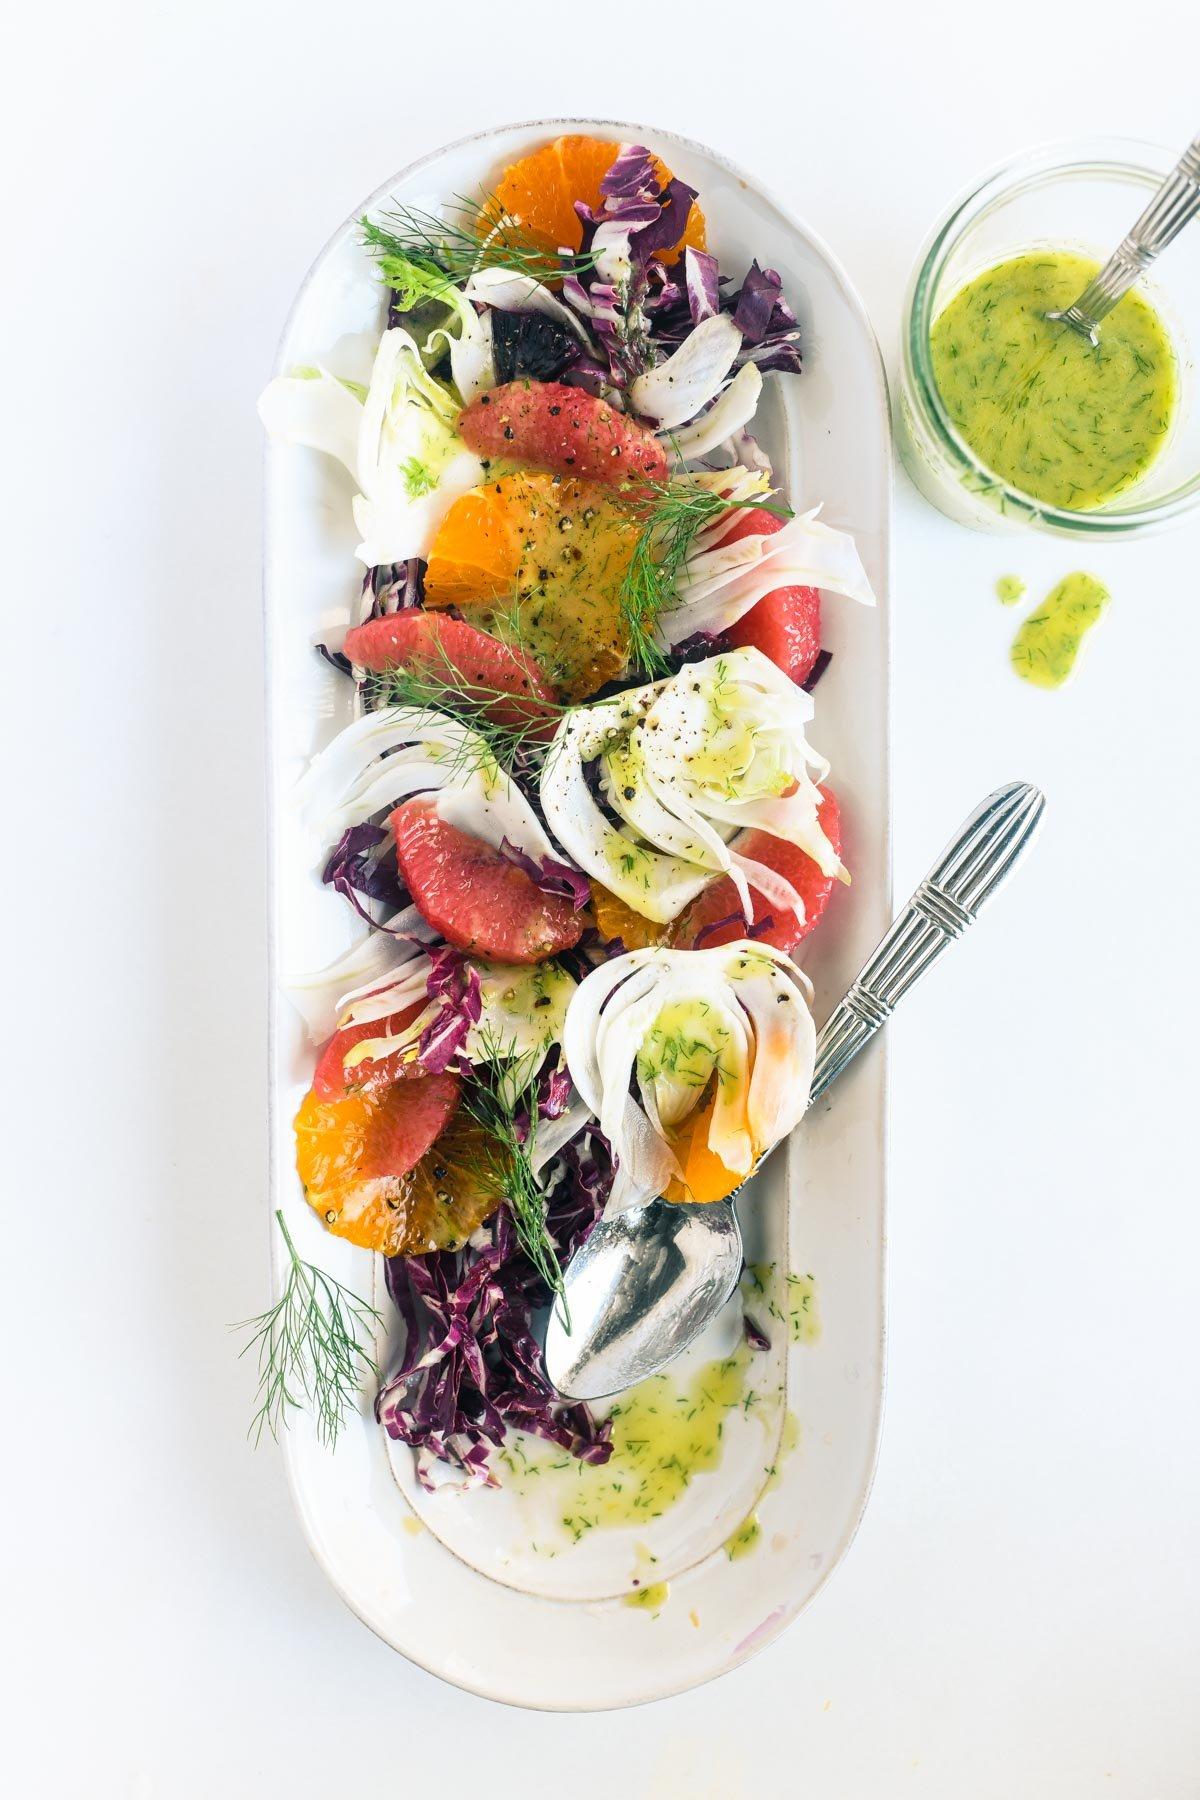 fennel, citrus, and radicchio salad with fennel vinaigrette